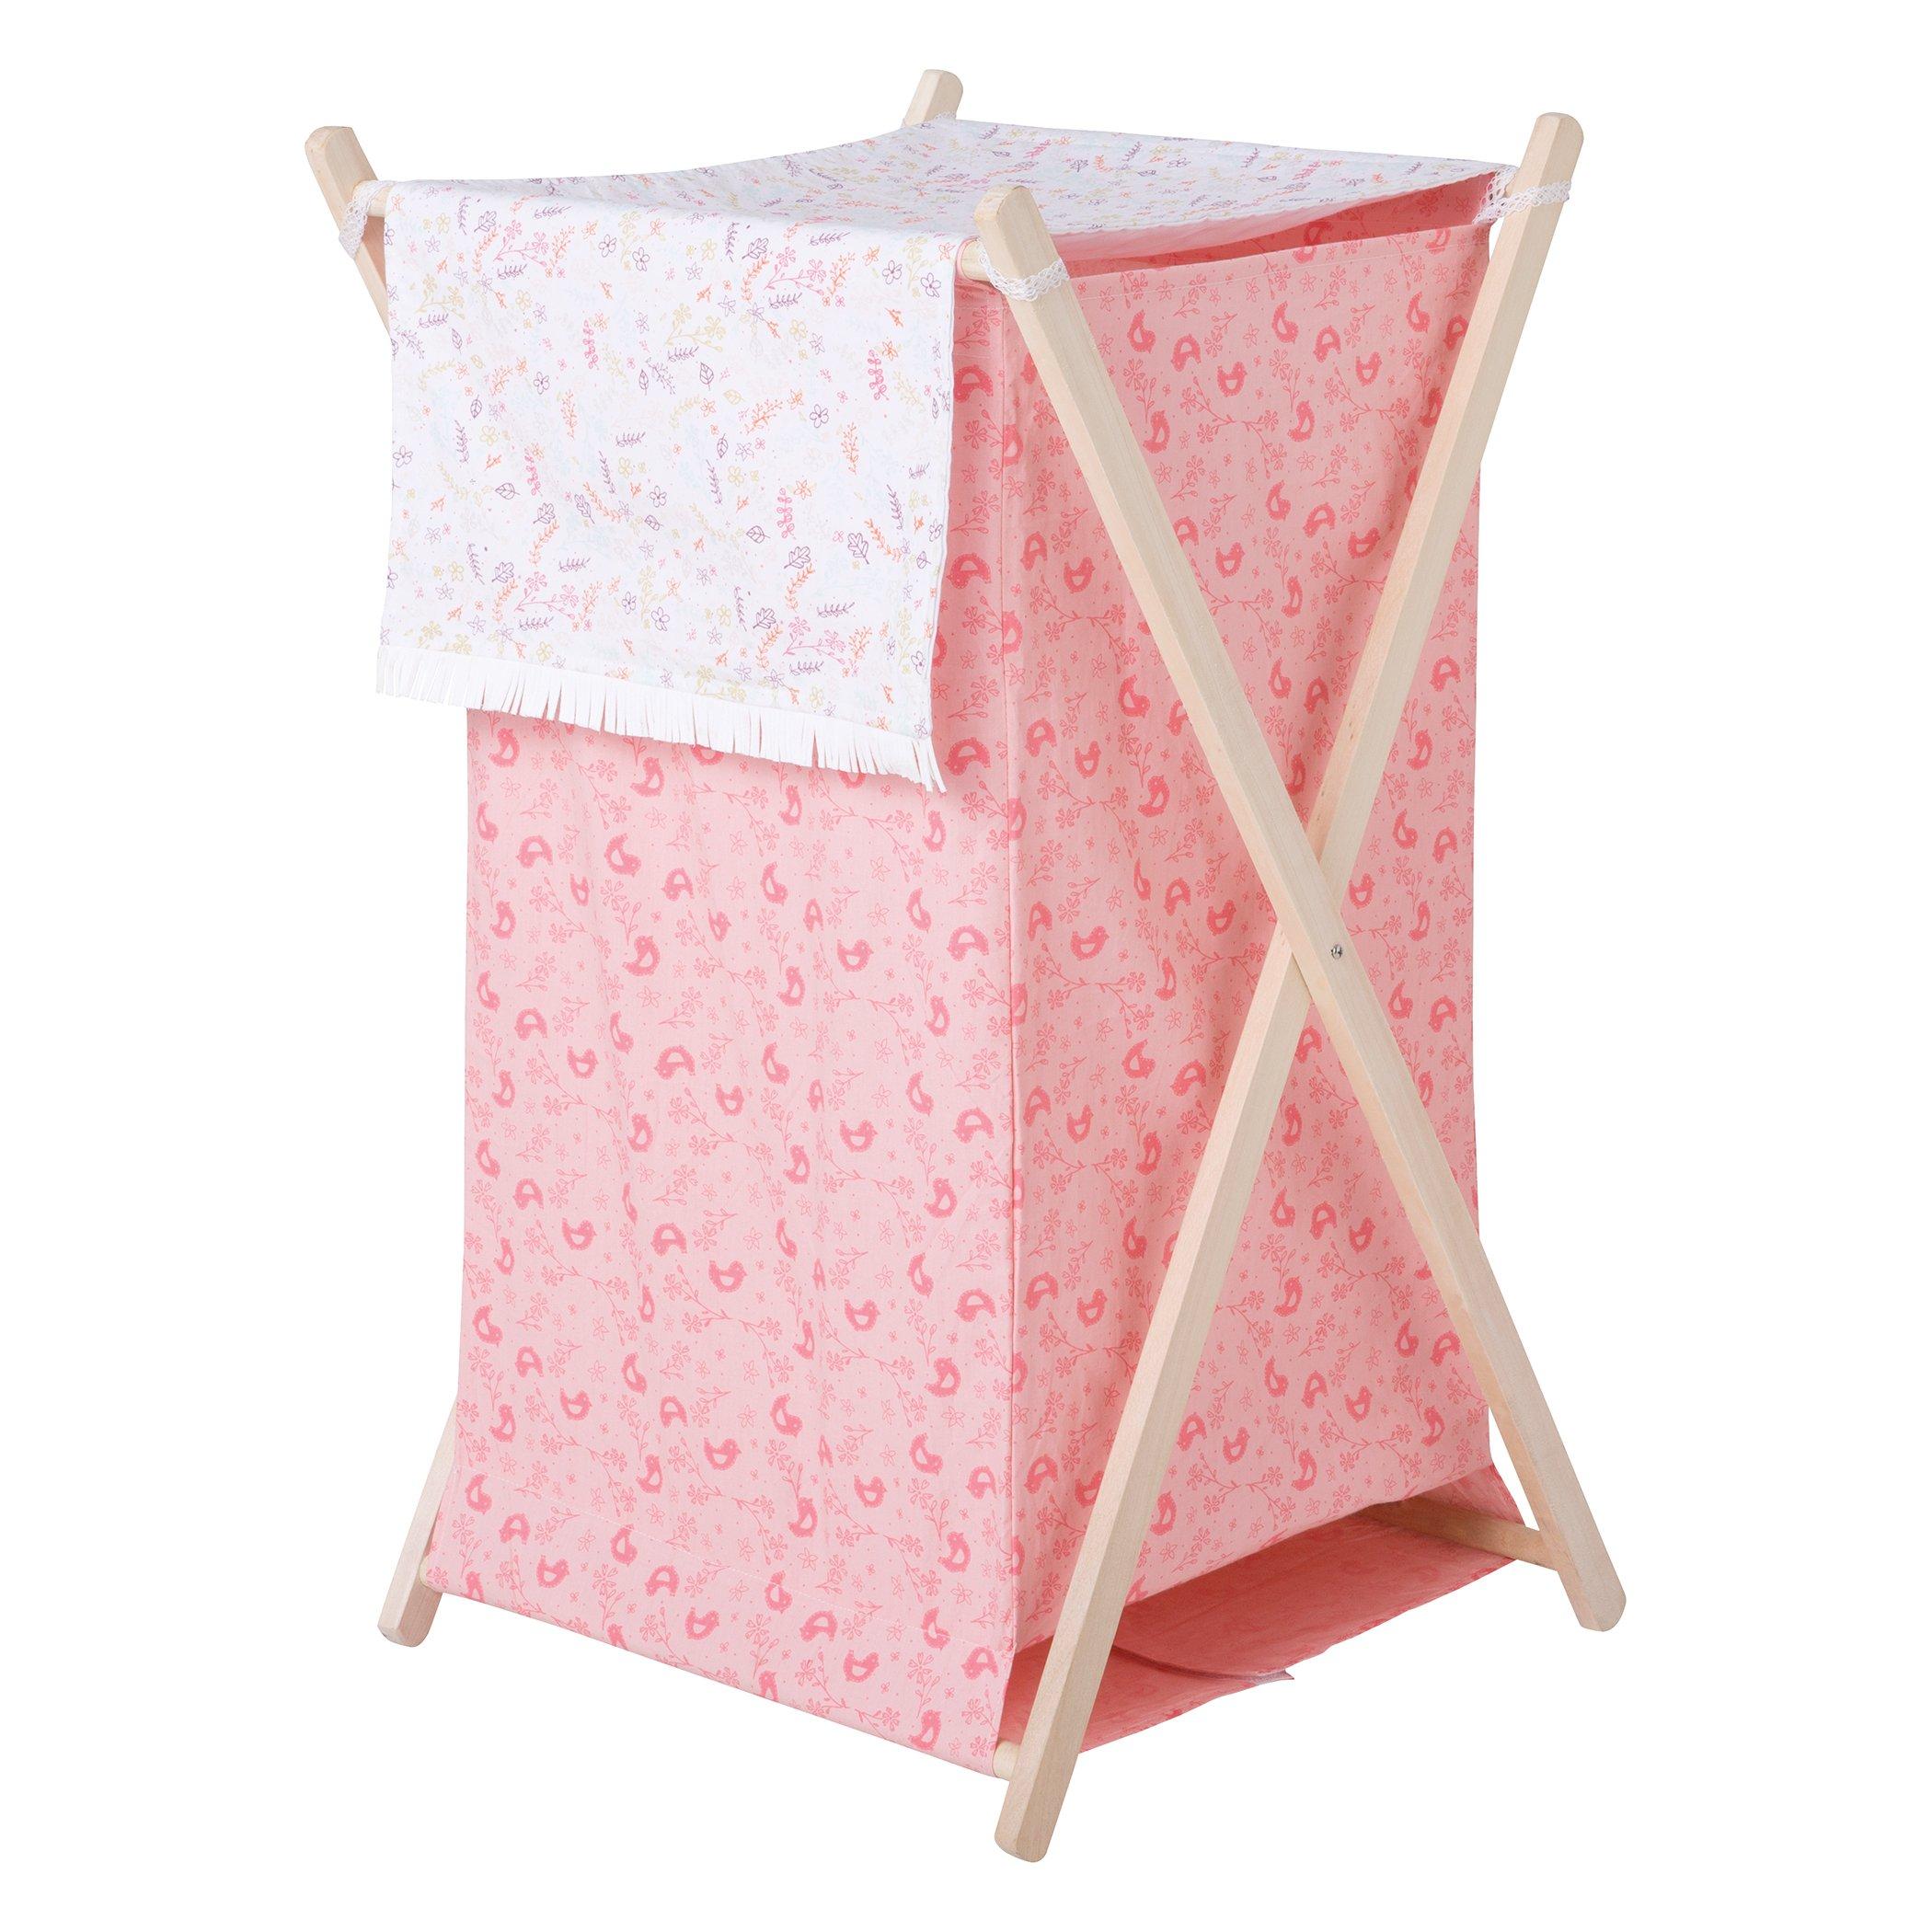 Trend Lab Wild Forever Hamper Set, Pink by Trend Lab